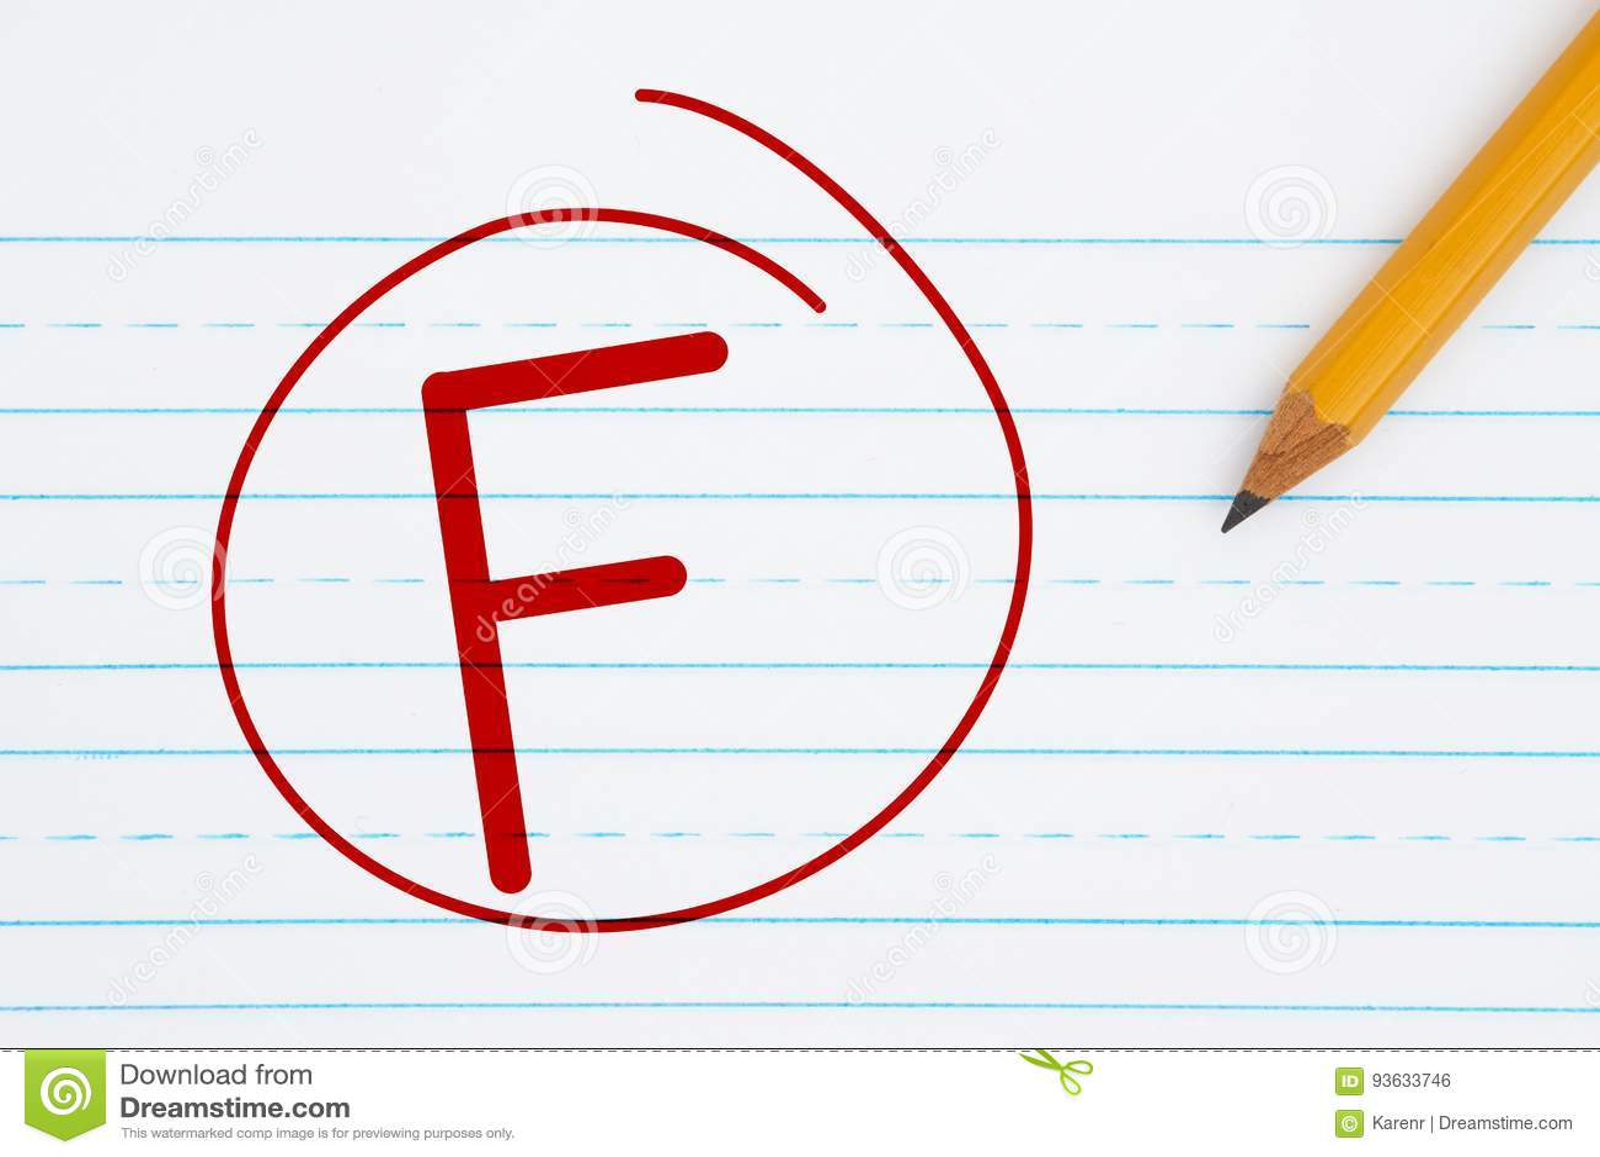 Getting A Grade F A Failing Grade Stock Photo - Image of grade, type